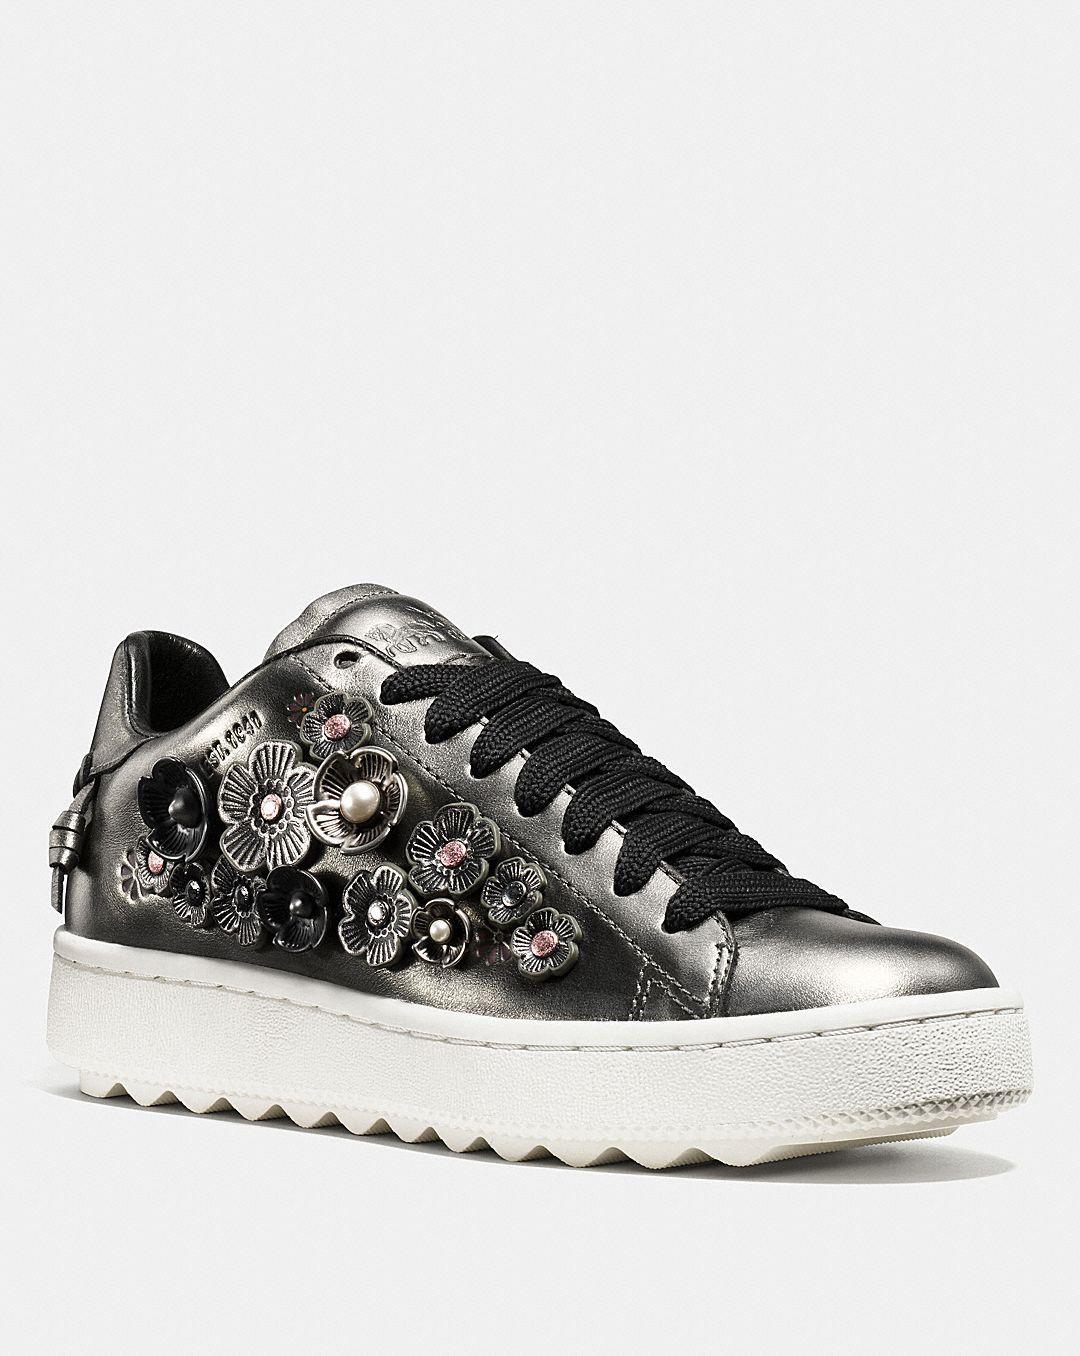 C101 LOW TOP SNEAKER | Sneakers, Womens